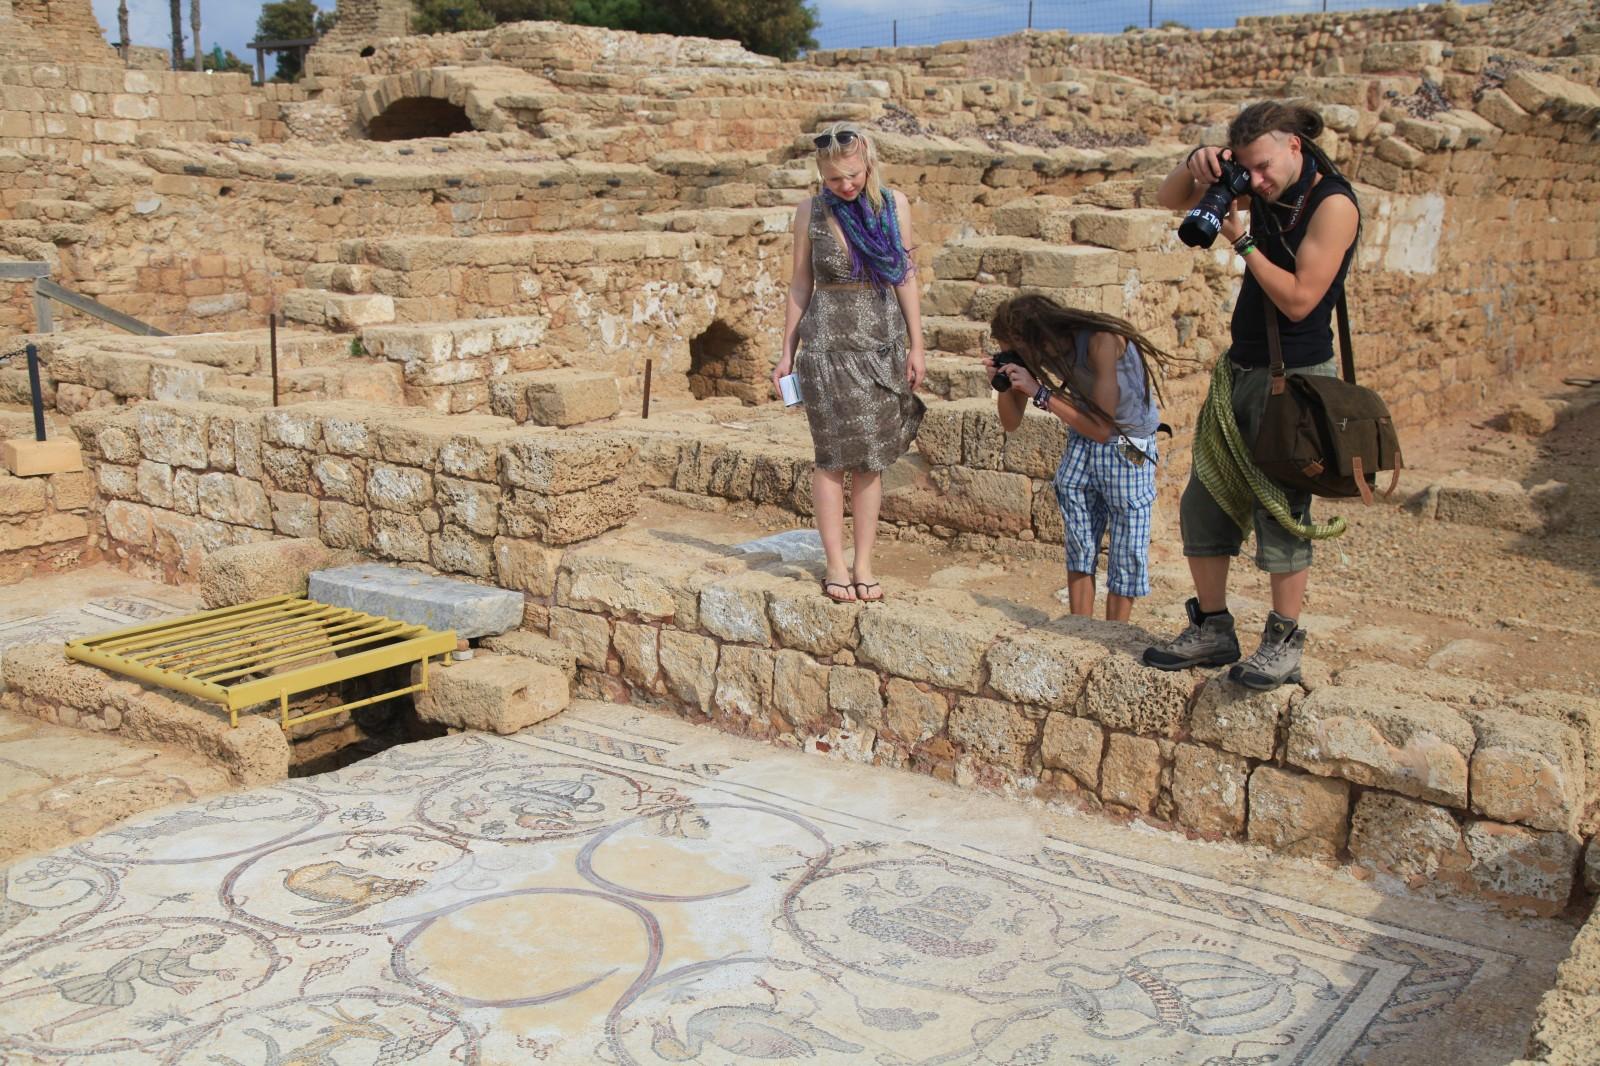 Typical tourists admiring Roman art